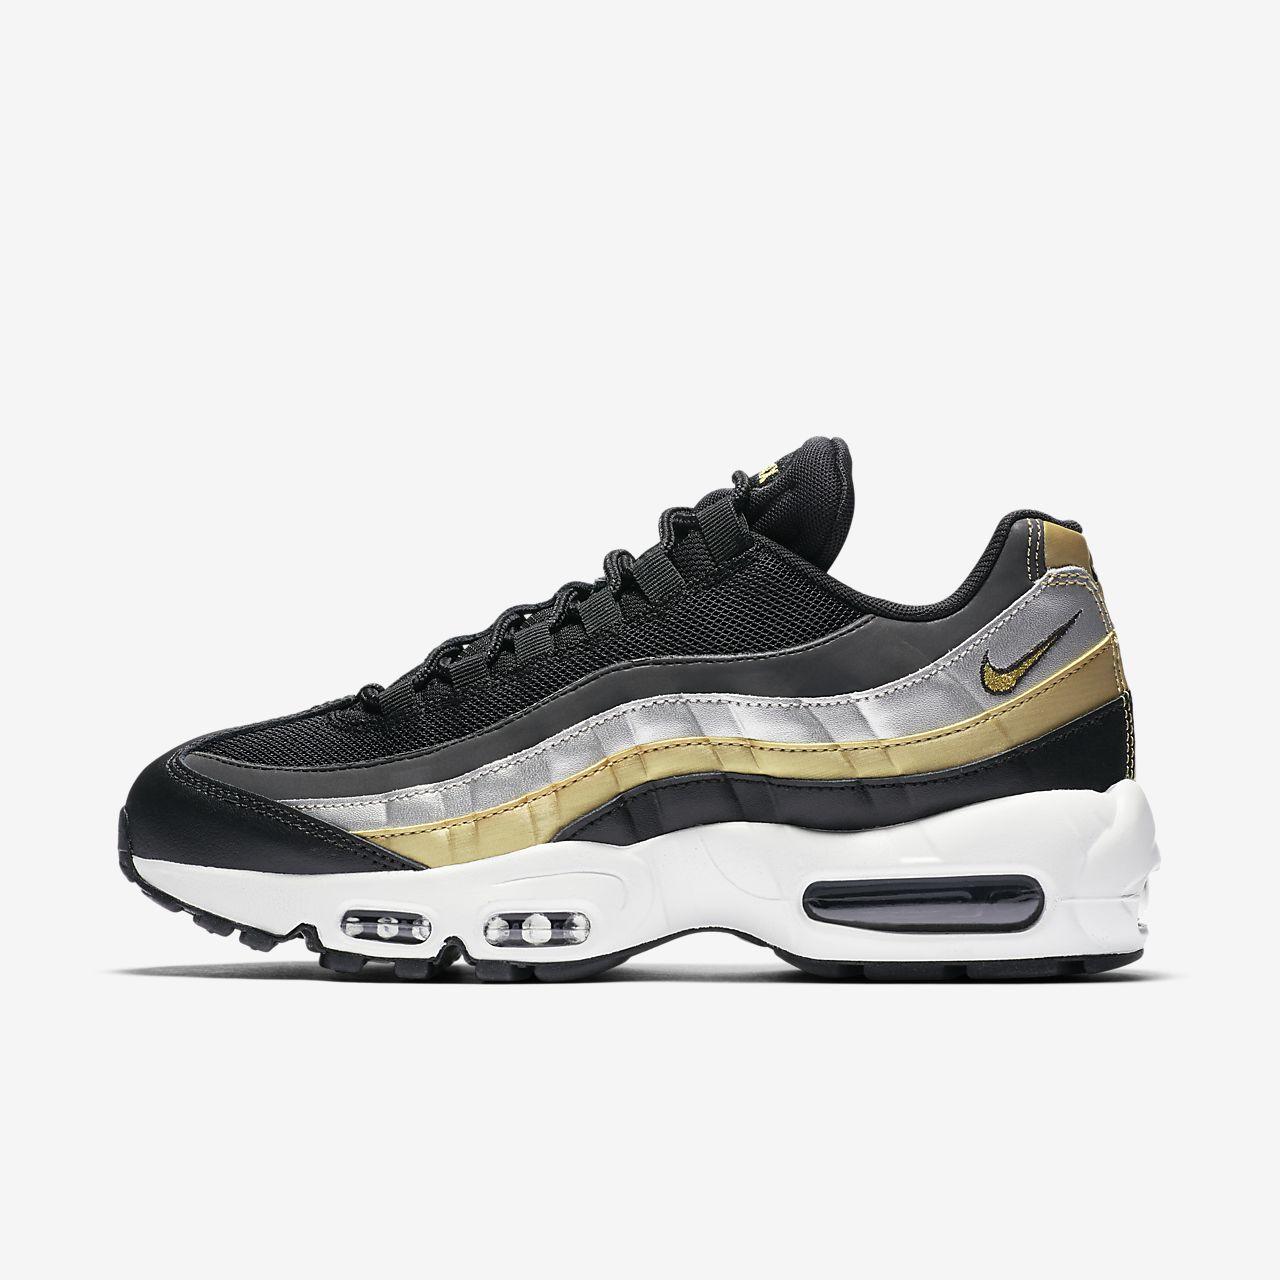 online store deb26 d574a ... Nike Air Max 95 Lux Metallic Womens Shoe